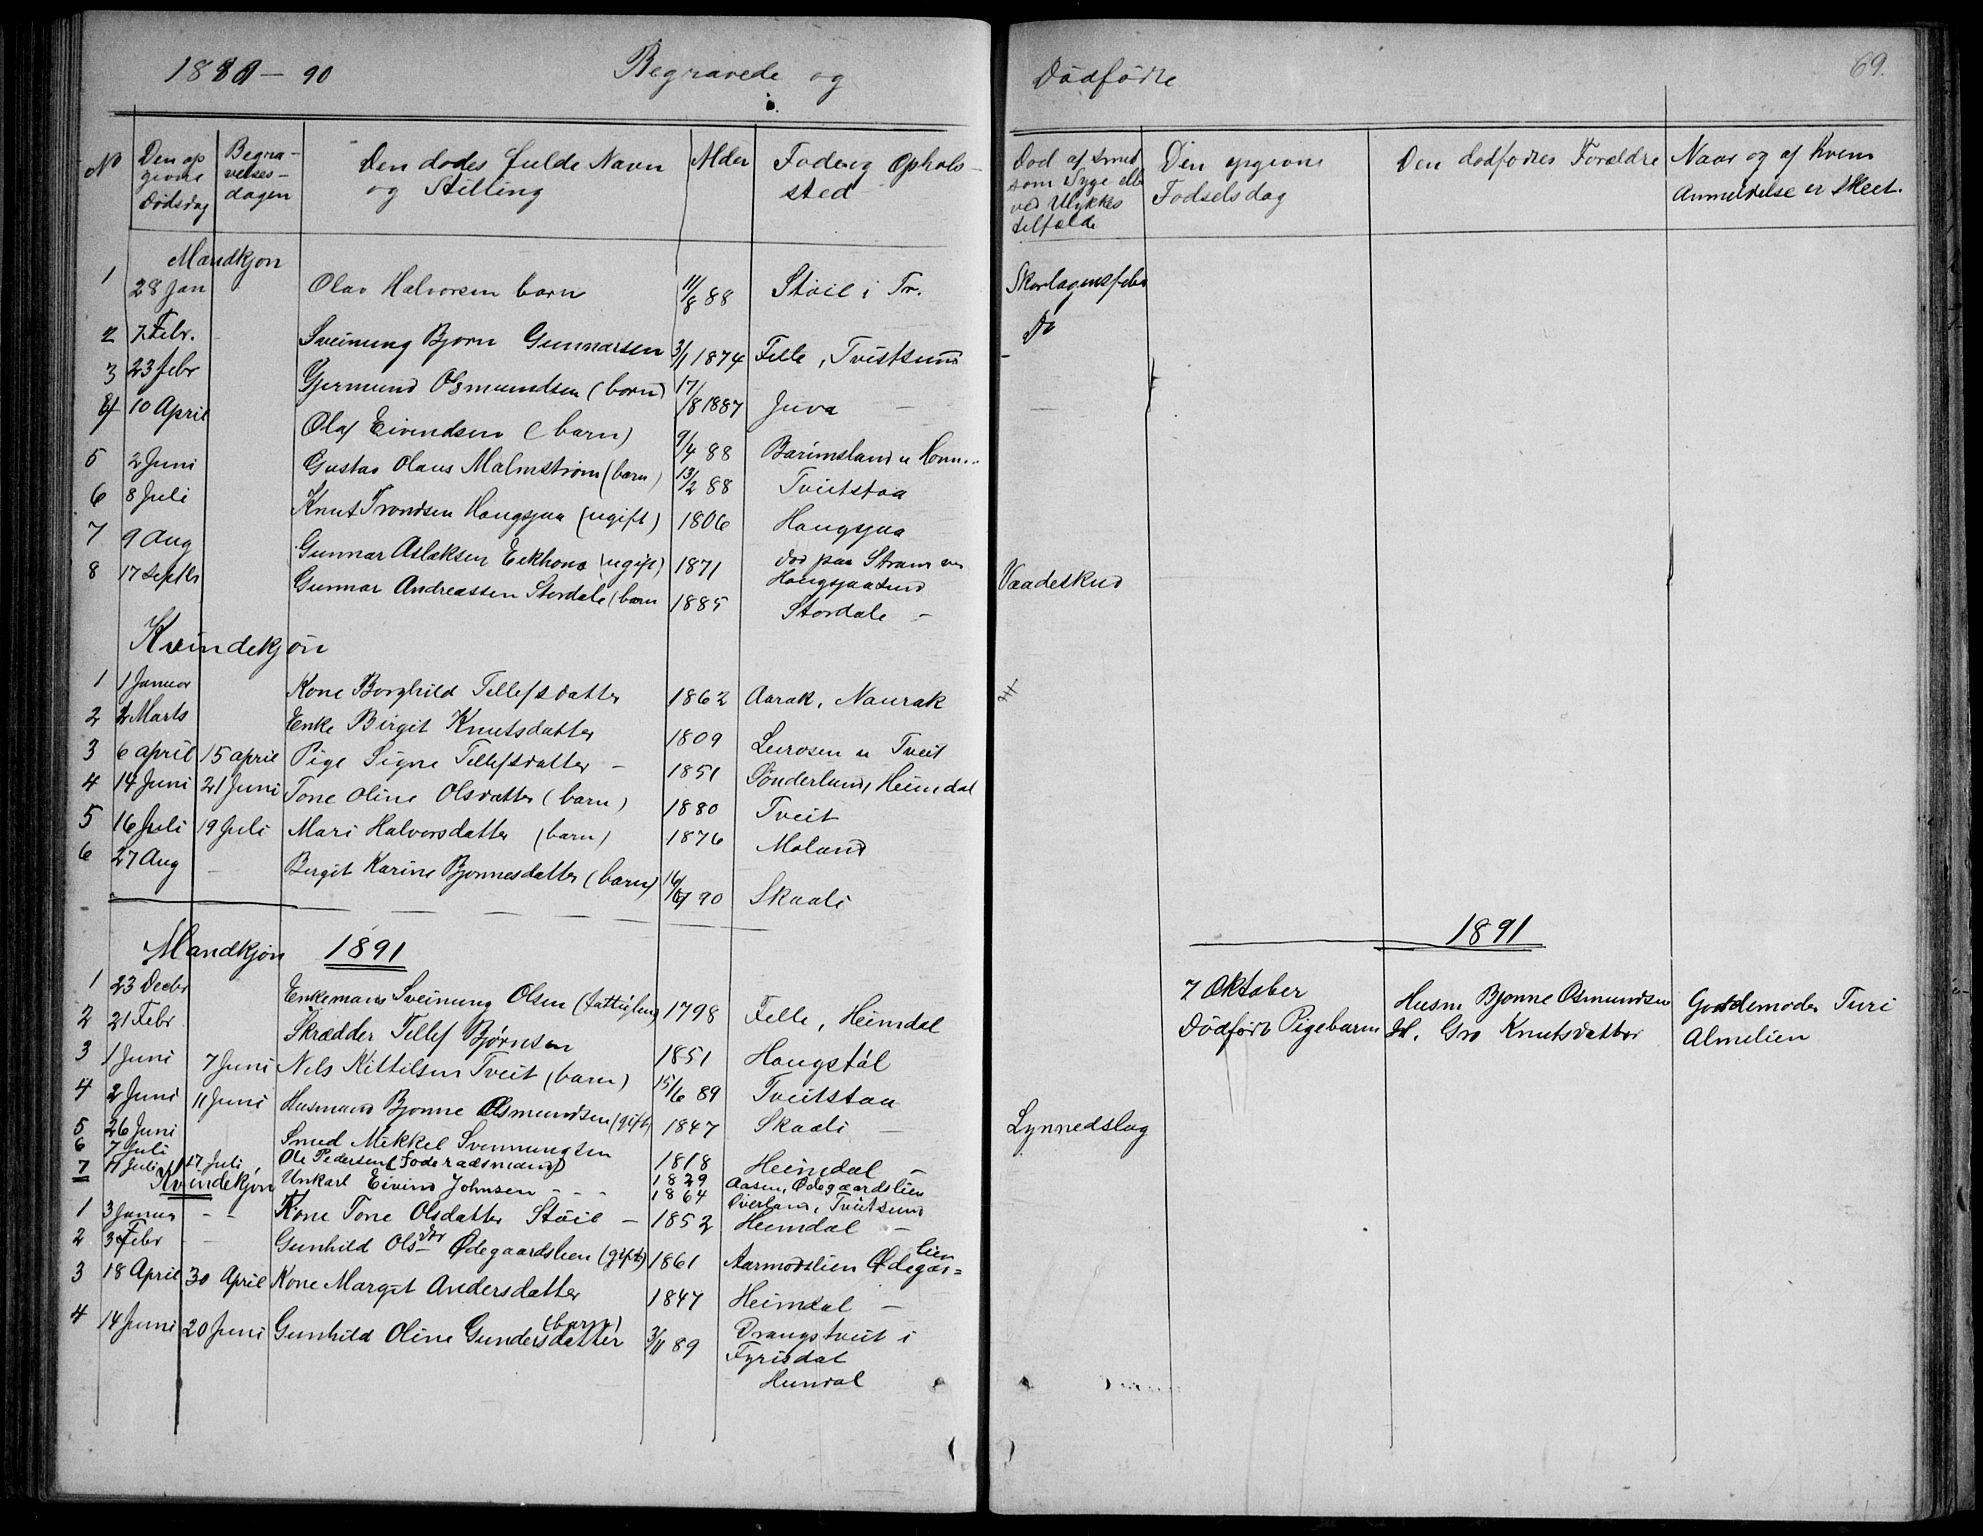 SAKO, Nissedal kirkebøker, G/Gb/L0002: Klokkerbok nr. II 2, 1863-1892, s. 69